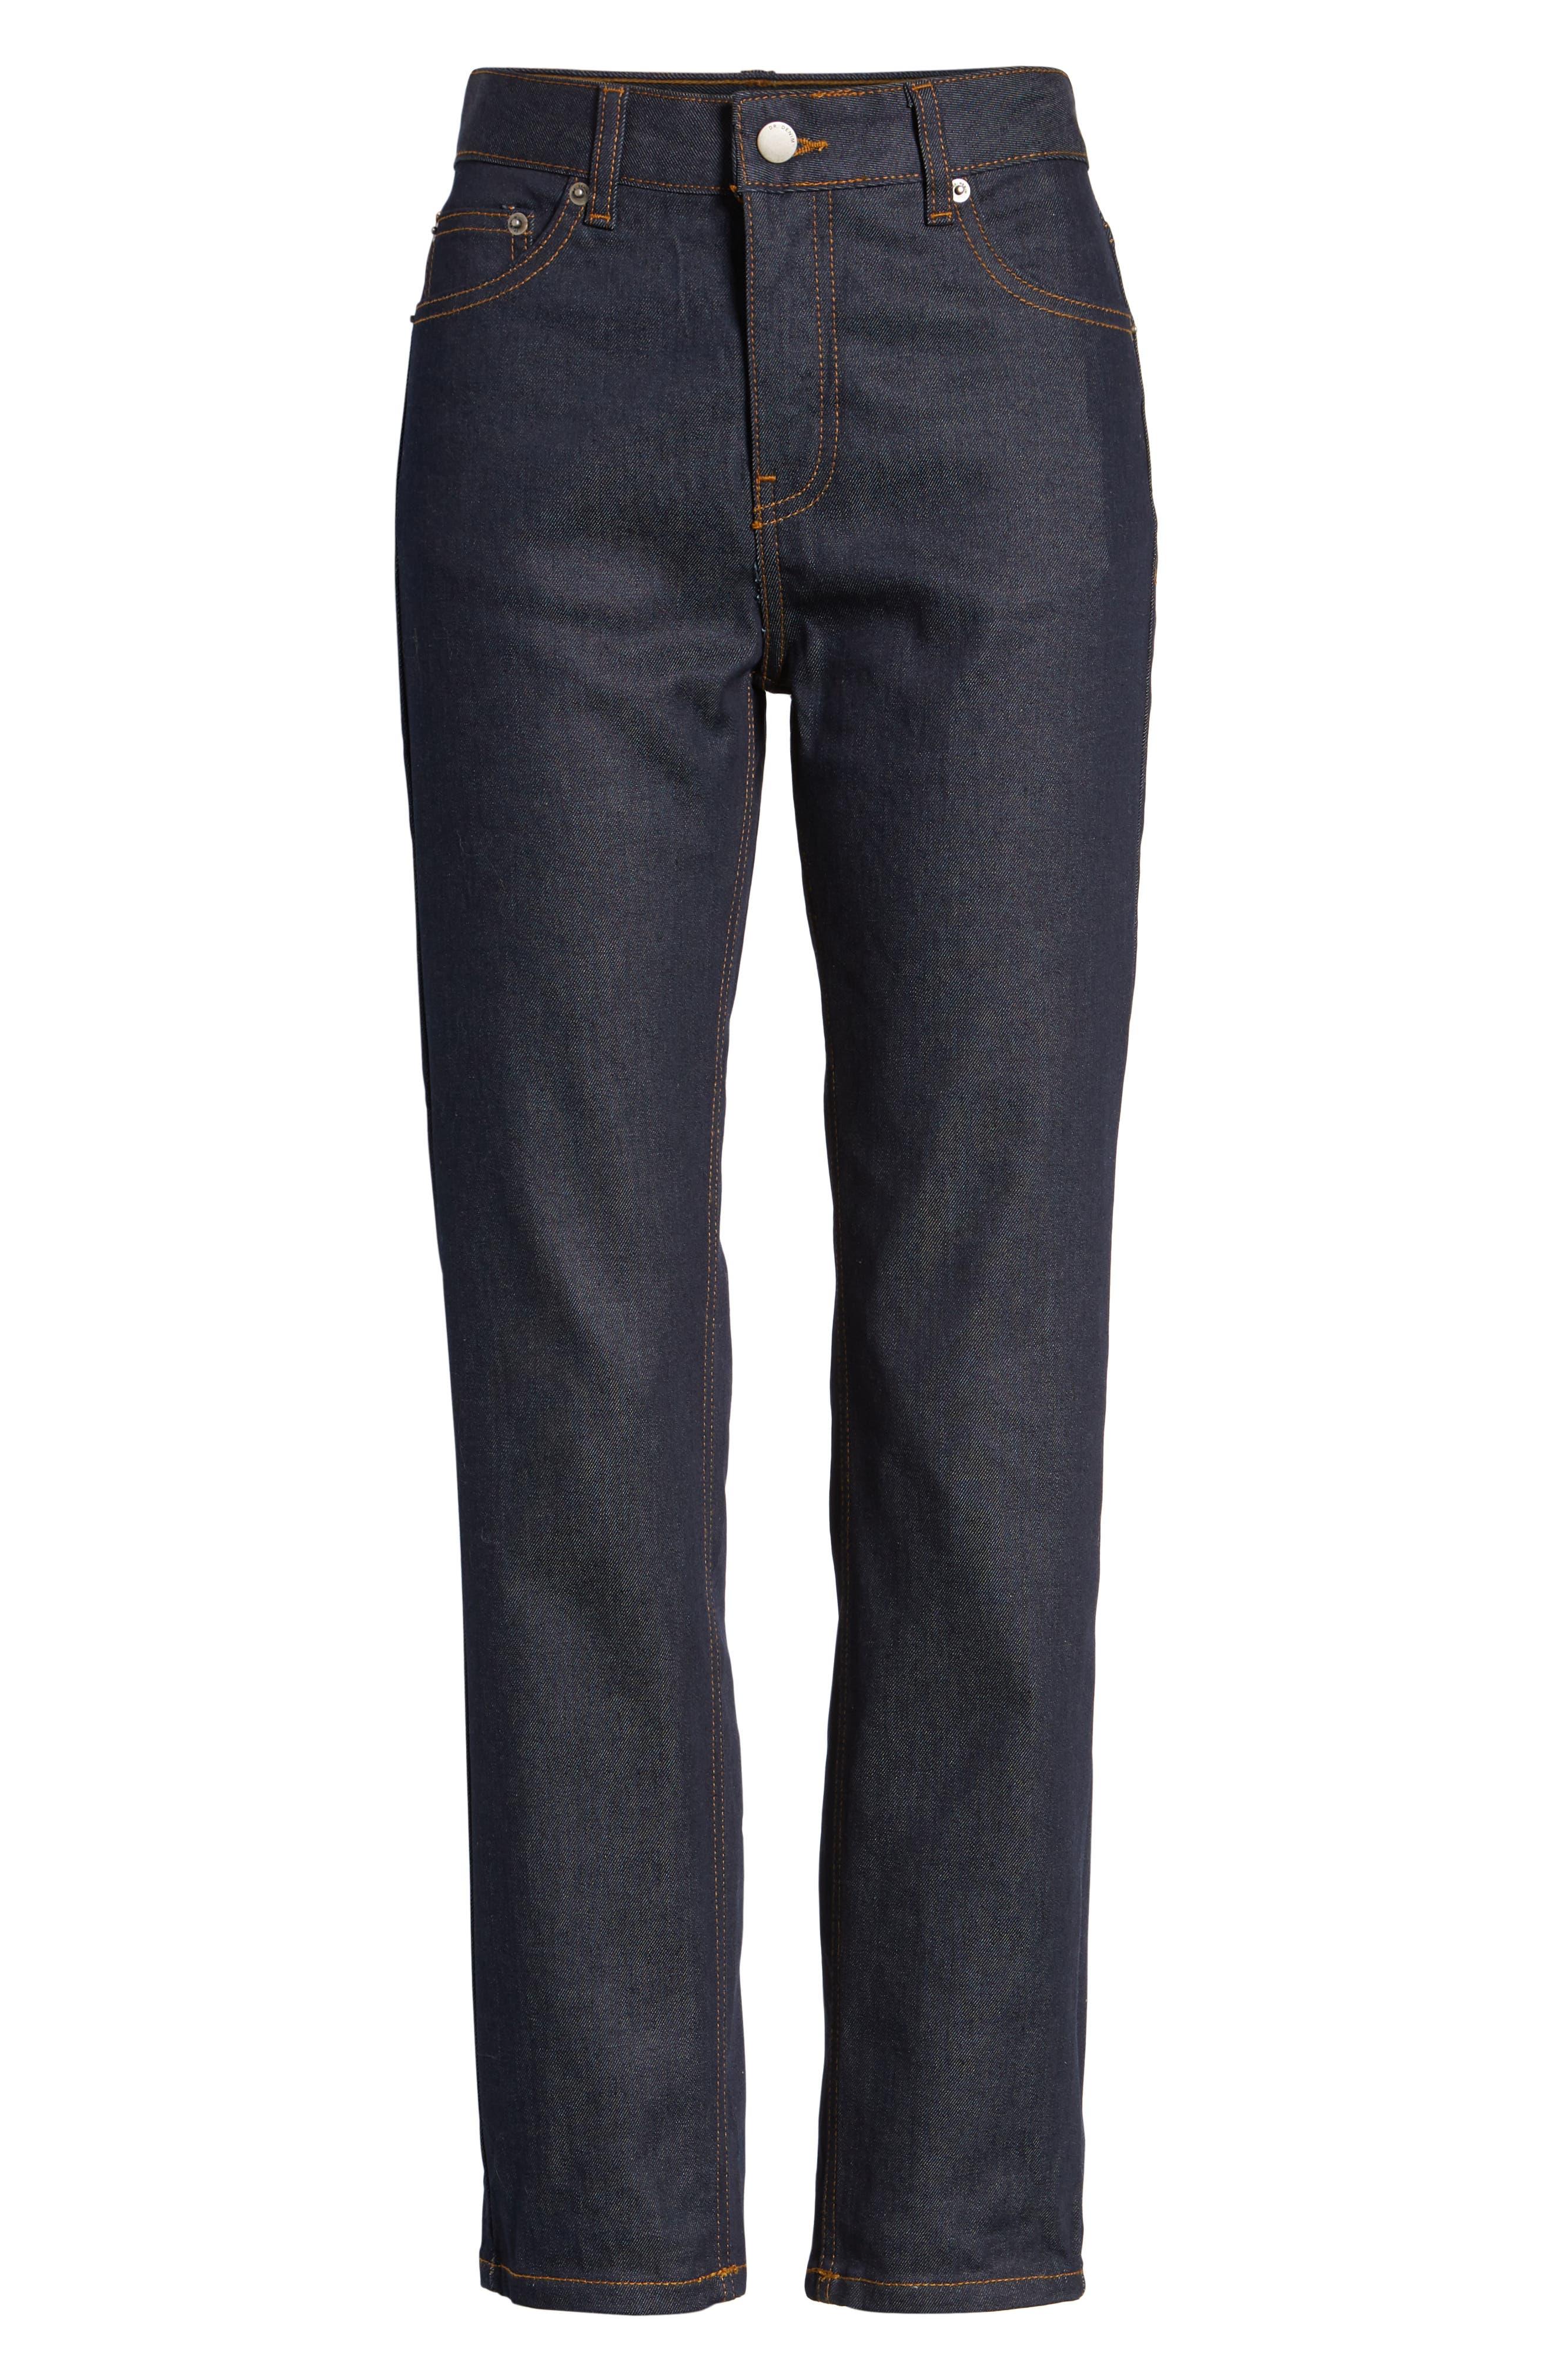 Edie High Waist Crop Jeans,                             Alternate thumbnail 7, color,                             RINSED BLUE